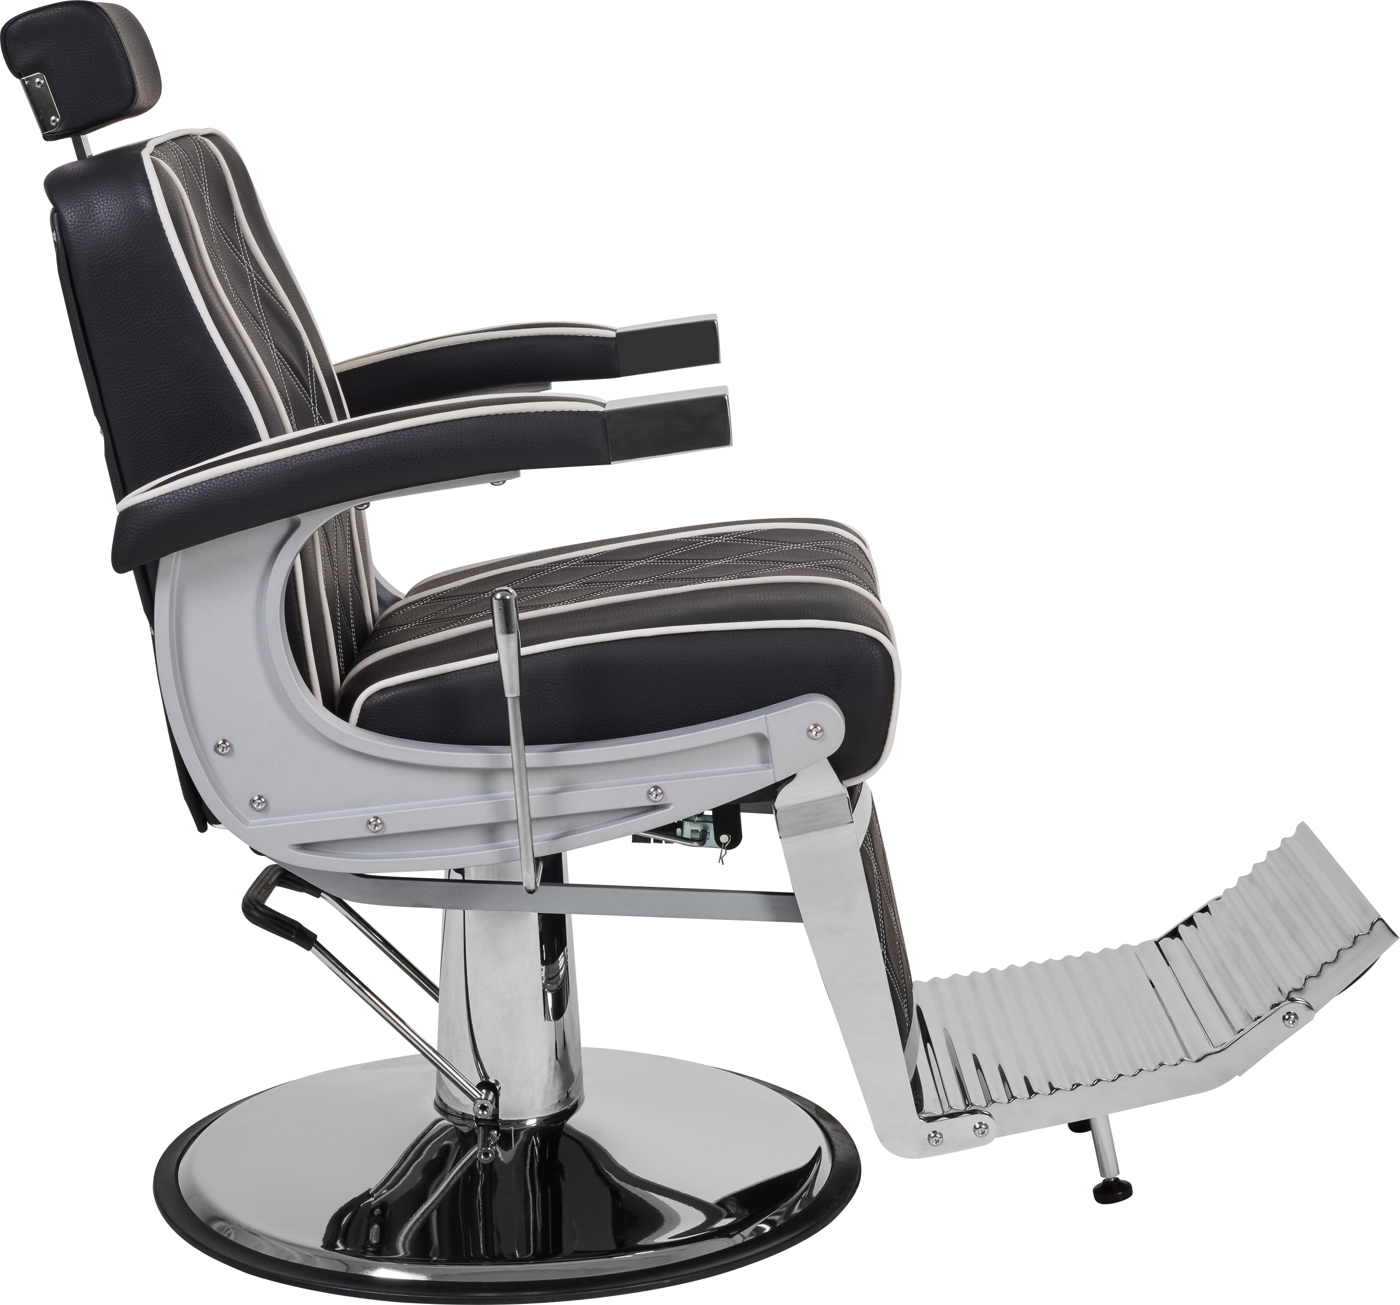 Barberarstol Borg